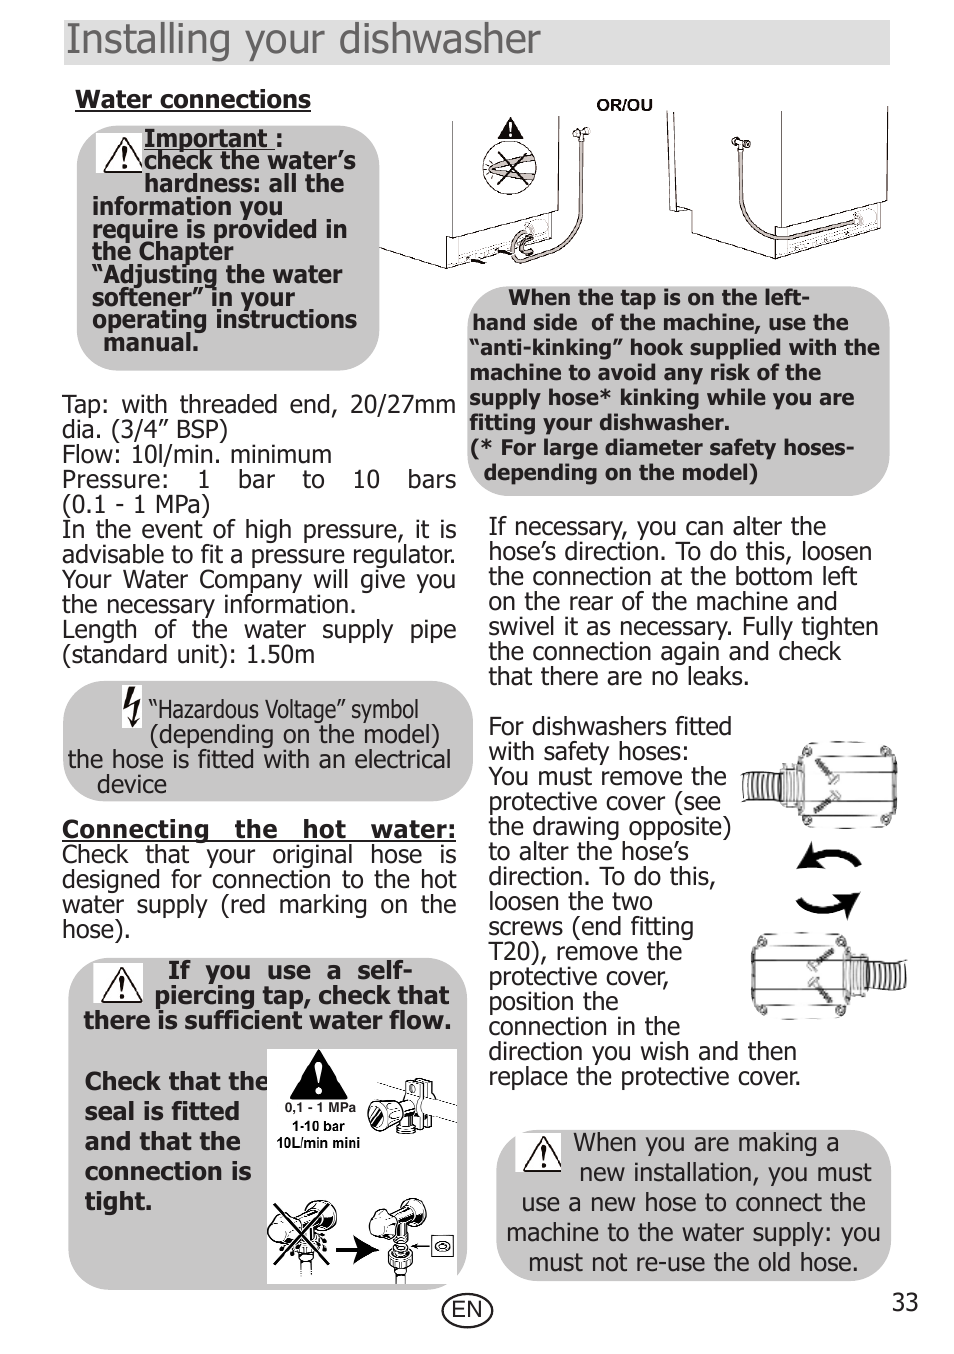 Installing Your Dishwasher De Dietrich Dvf300je1 User Manual